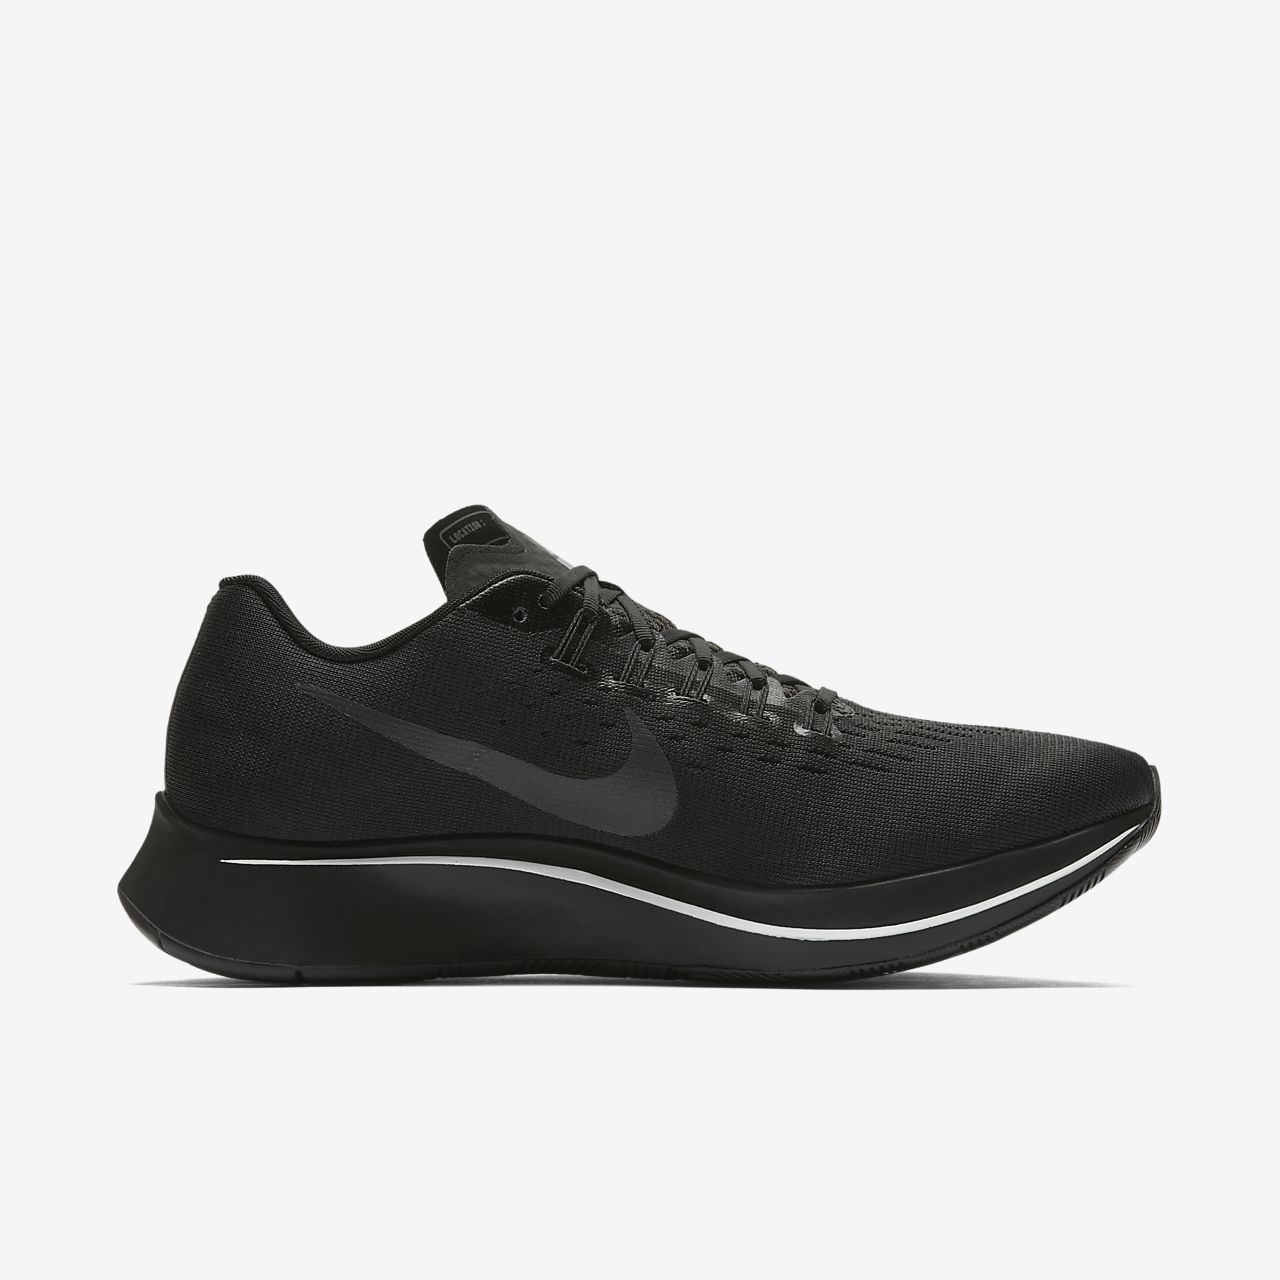 the best attitude 8de0e 978a4 Nike Zoom Fly Men s Running Shoe. Nike.com GB